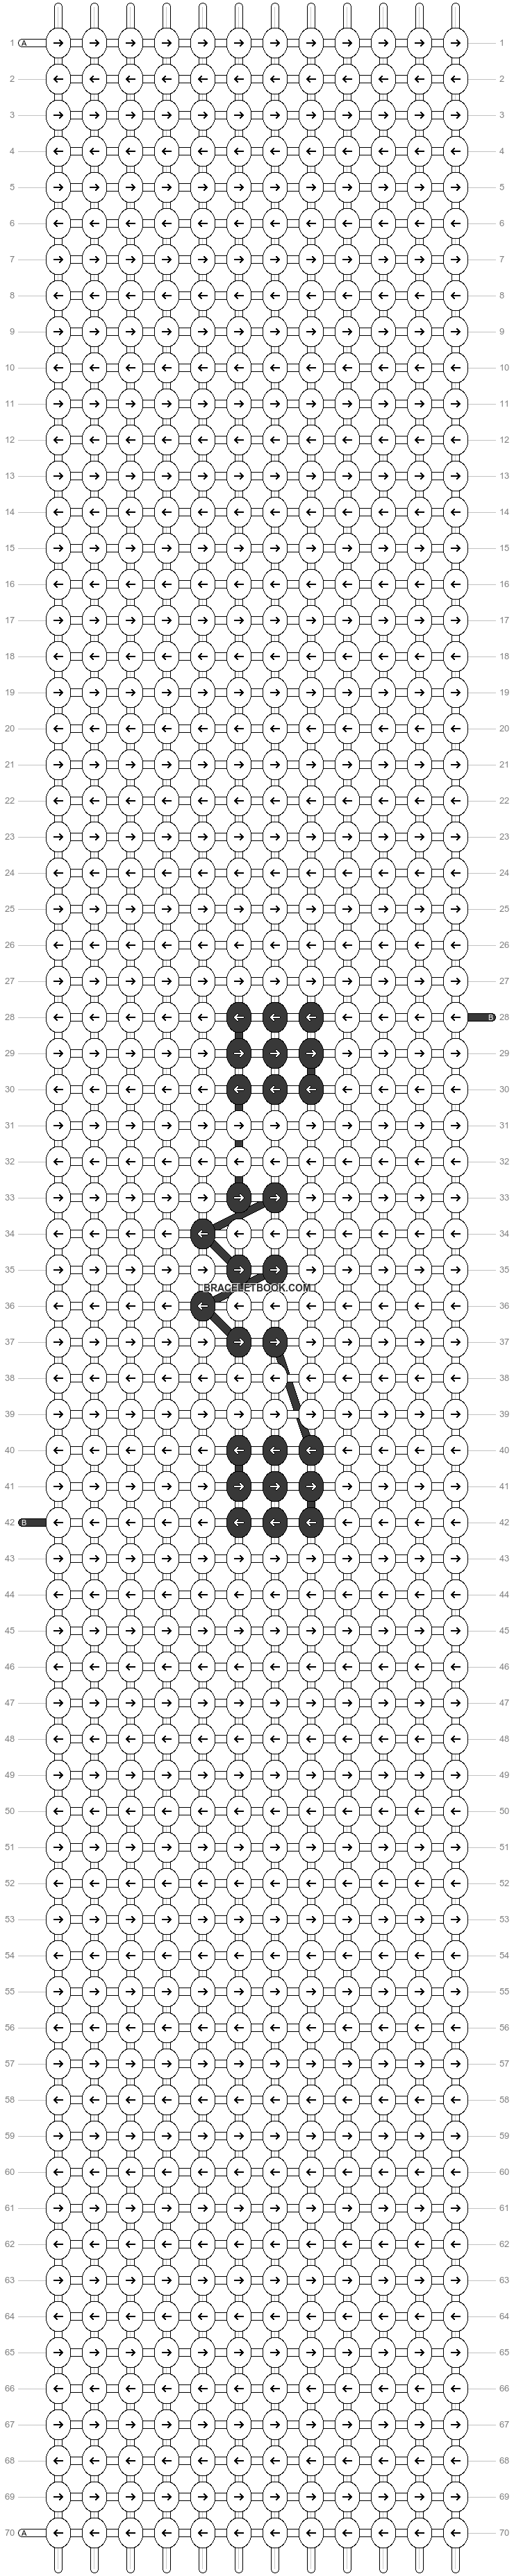 Alpha pattern #45878 variation #81901 pattern